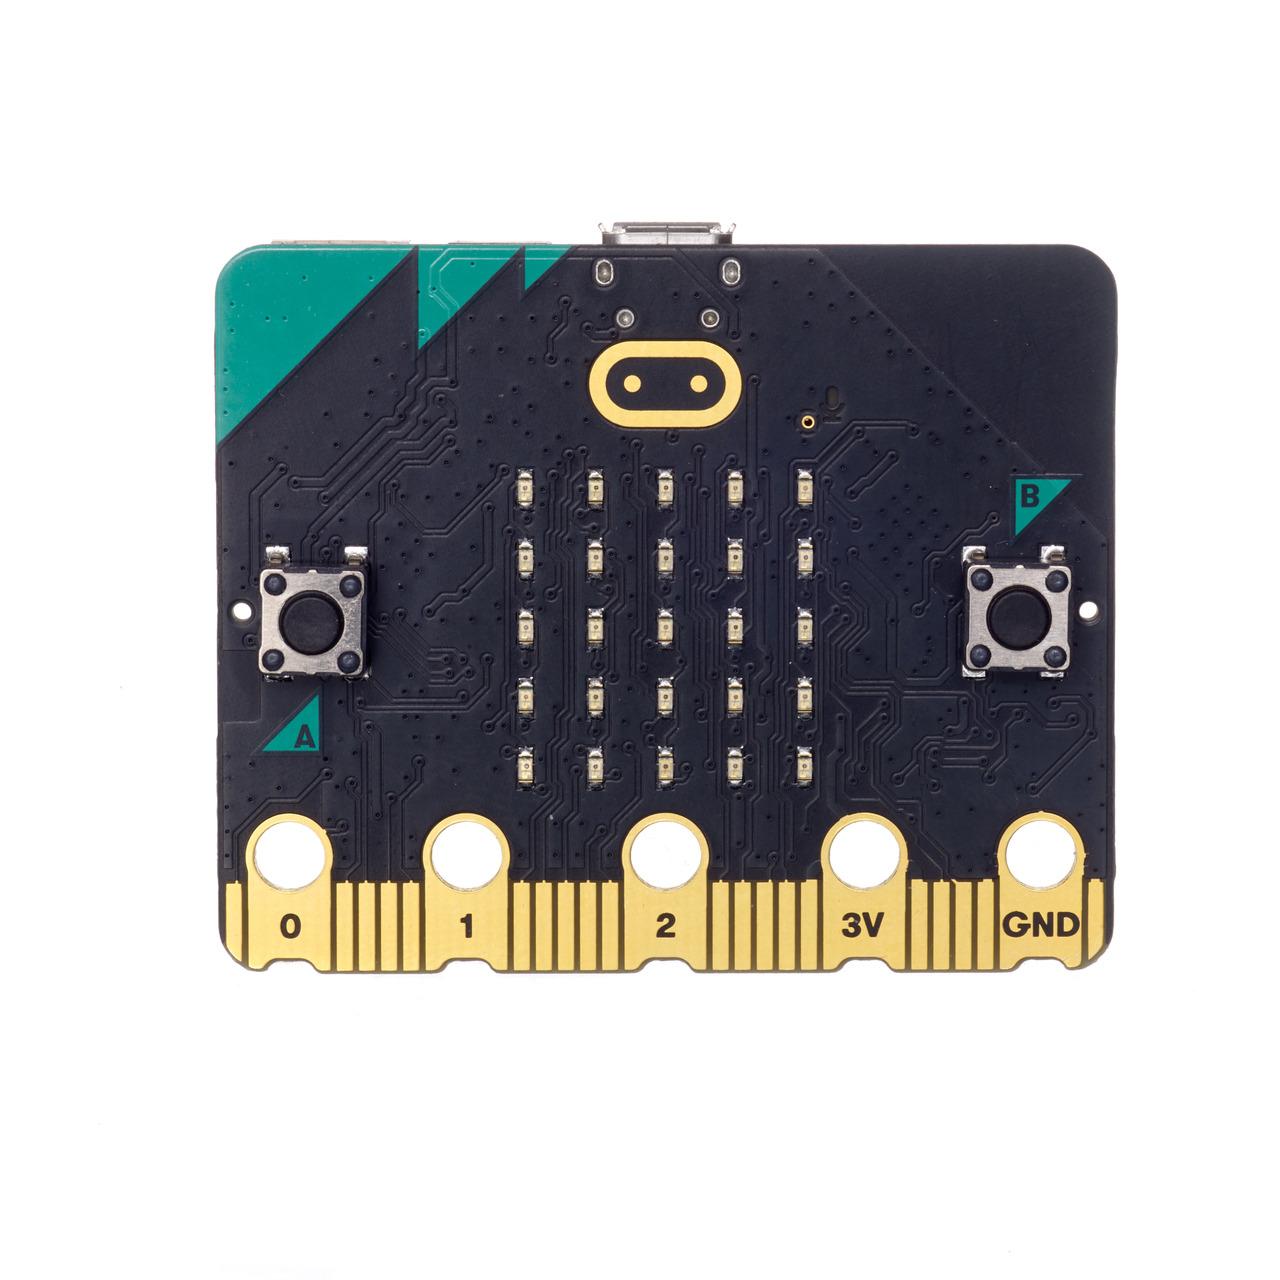 Lerncomputer BBC micro:bit v2- Einplatinencomputer